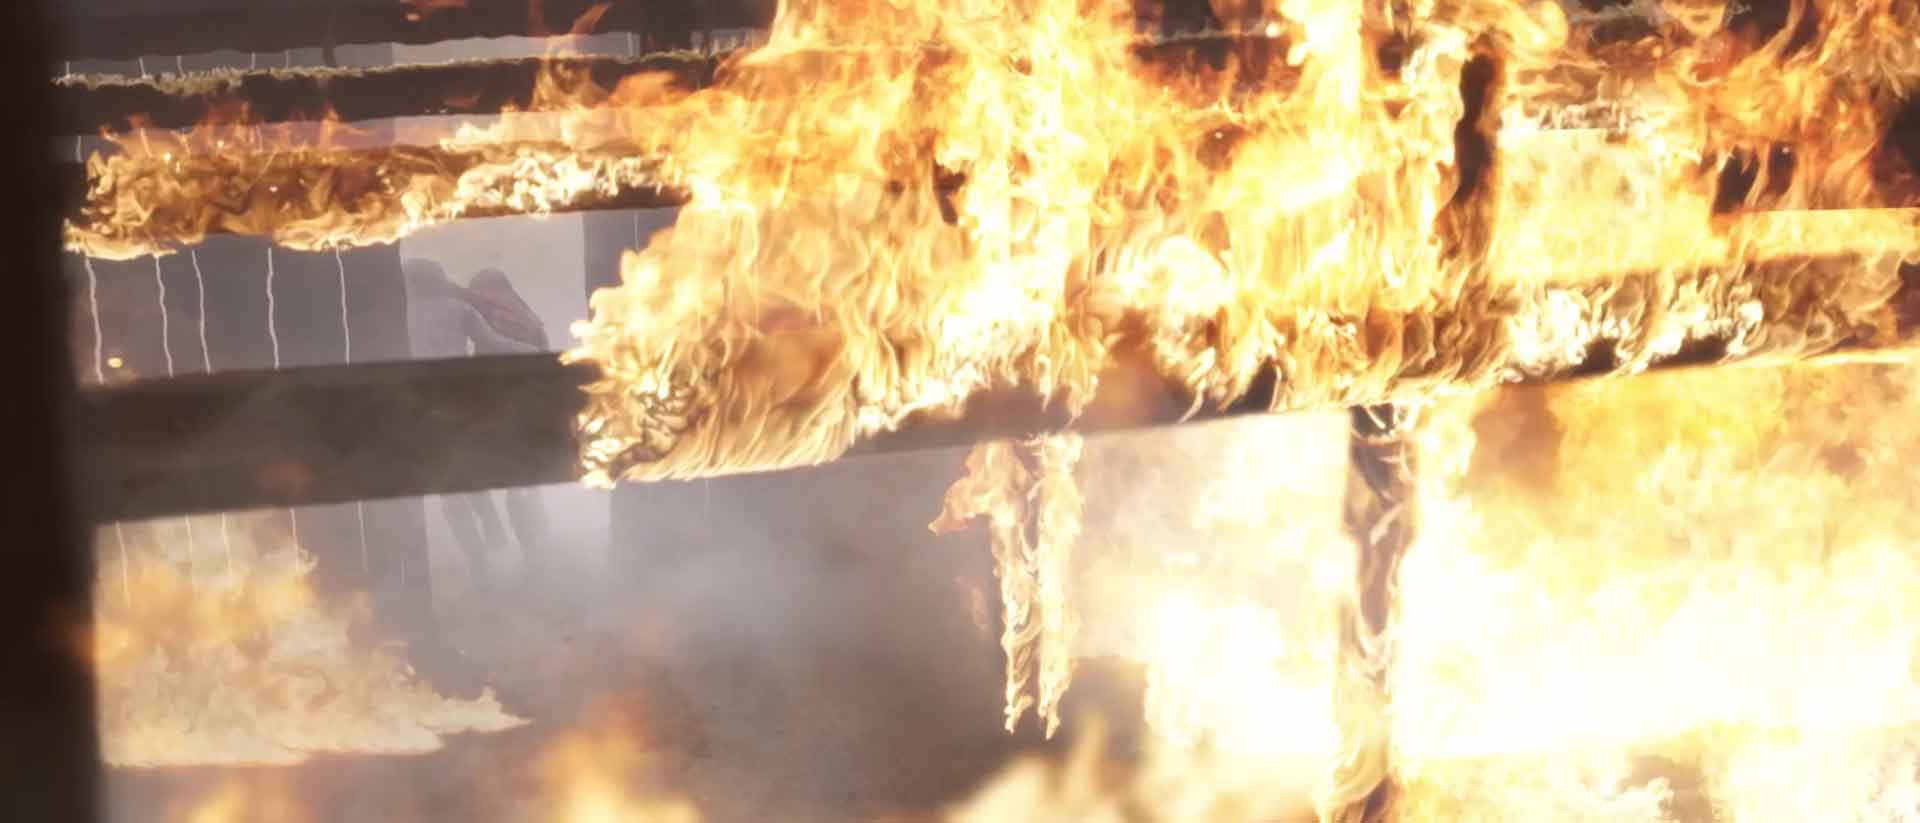 Burning poles tutorial banner image